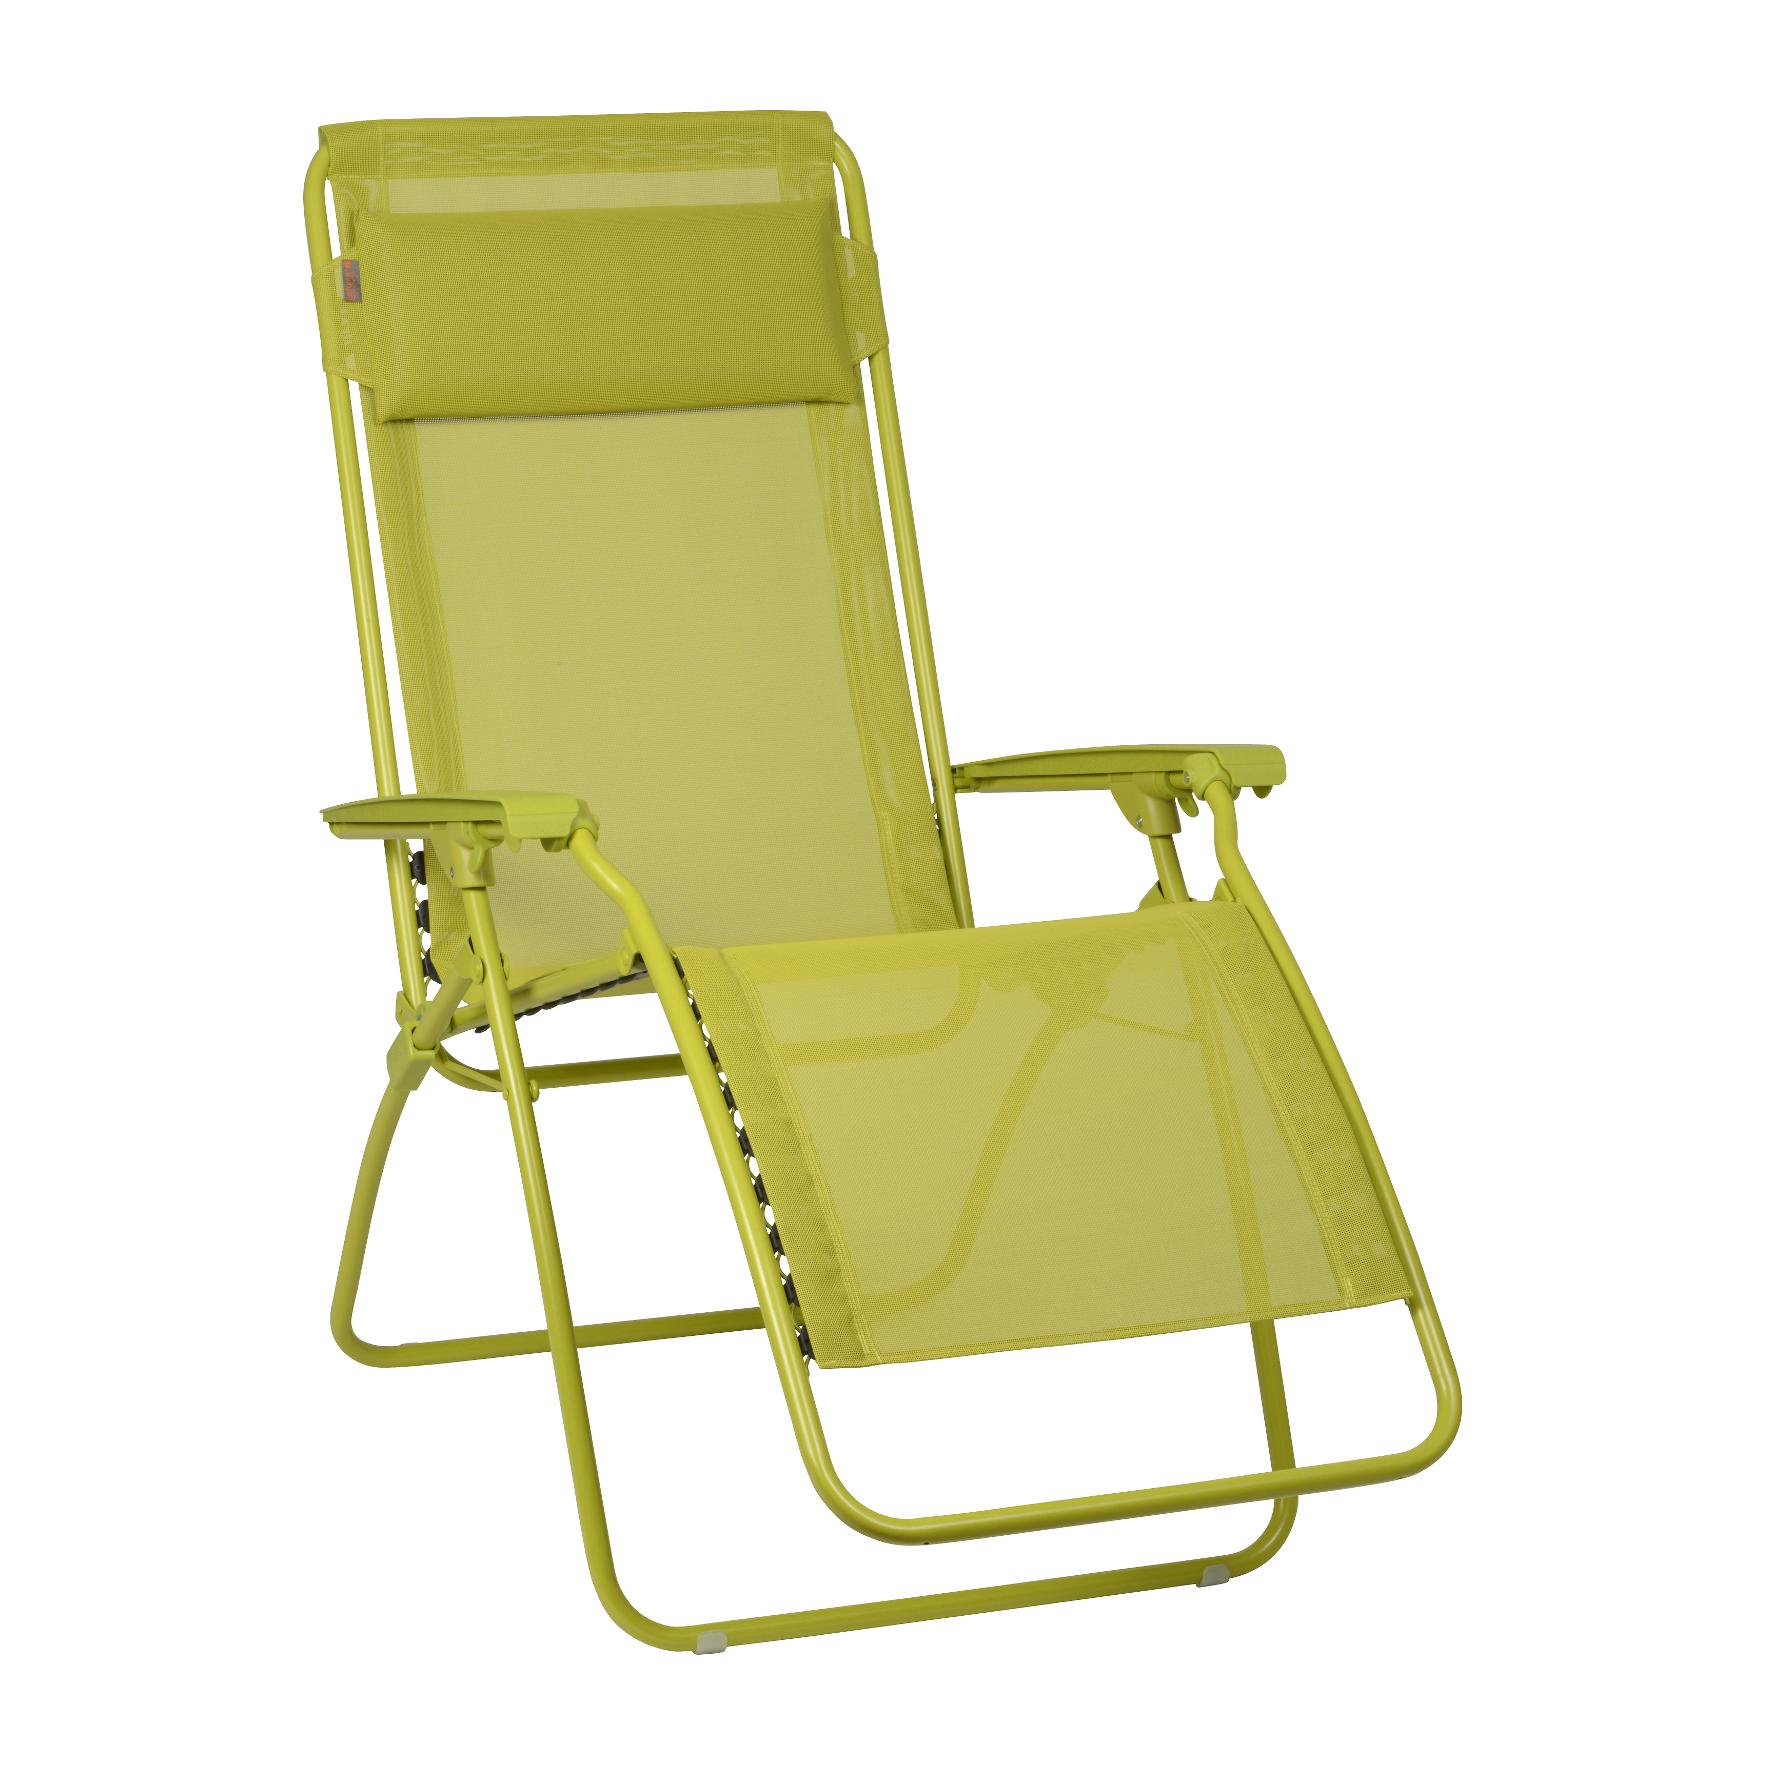 Lafuma c r clip chaise pliante colorblock batyline vert 2 for Chaise bain de soleil pliante